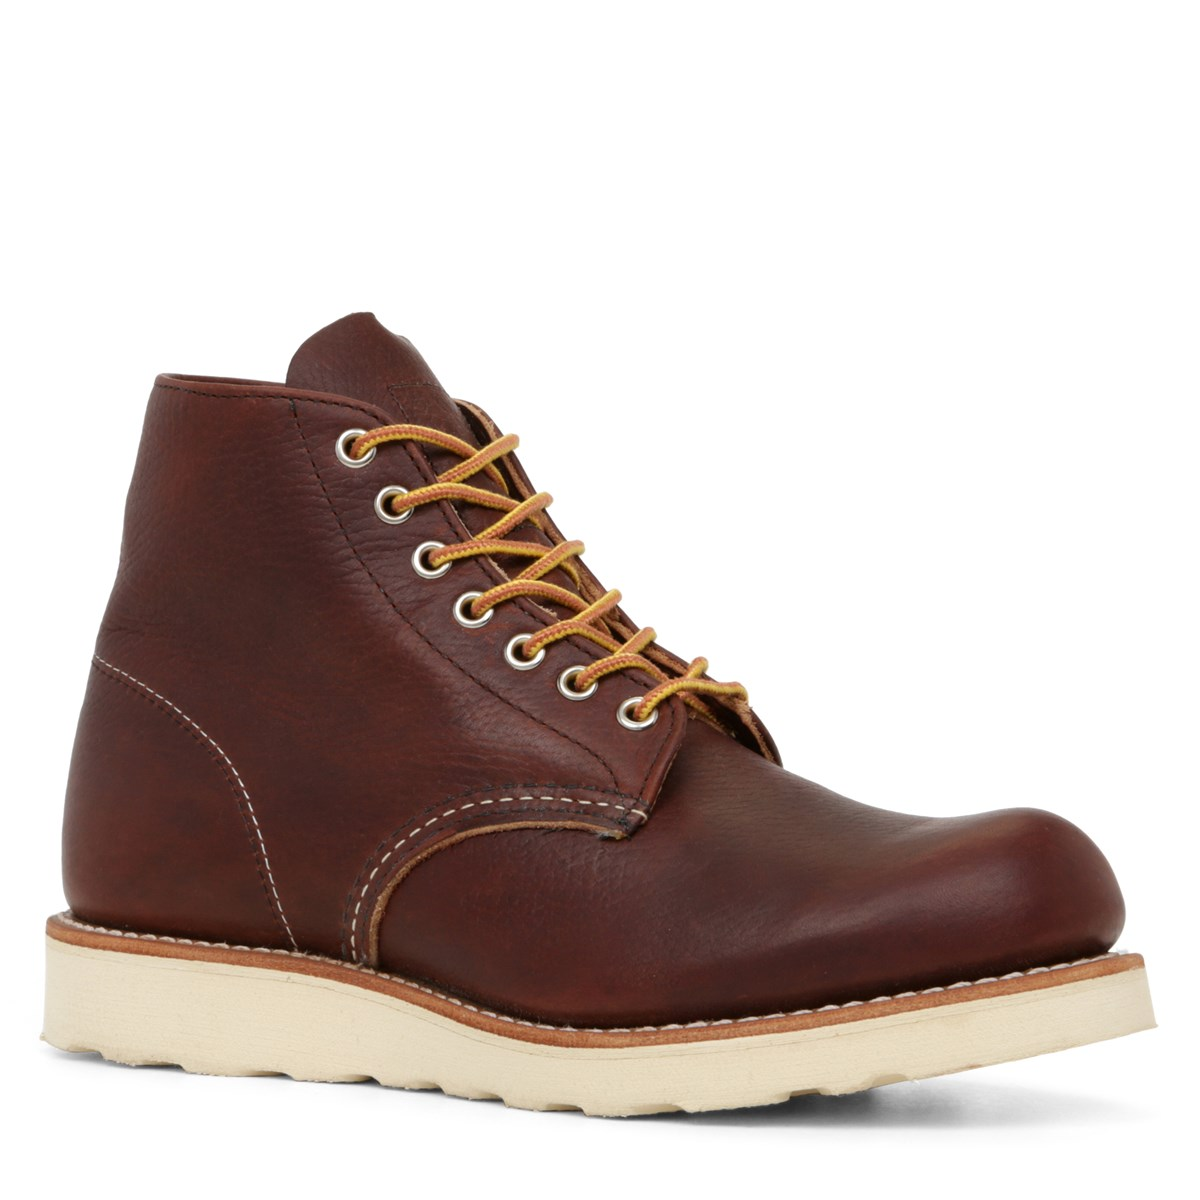 Men's Round Toe Brown Miscellaneous